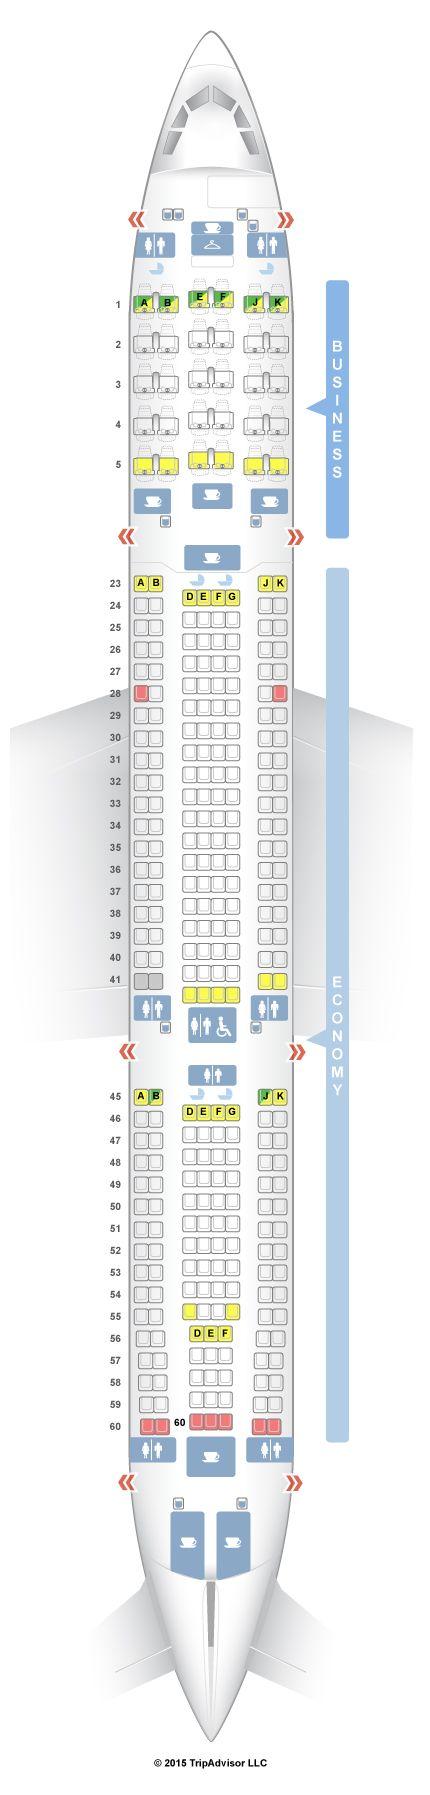 SeatGuru Seat Map Qantas Airbus A330-300 (333) V1